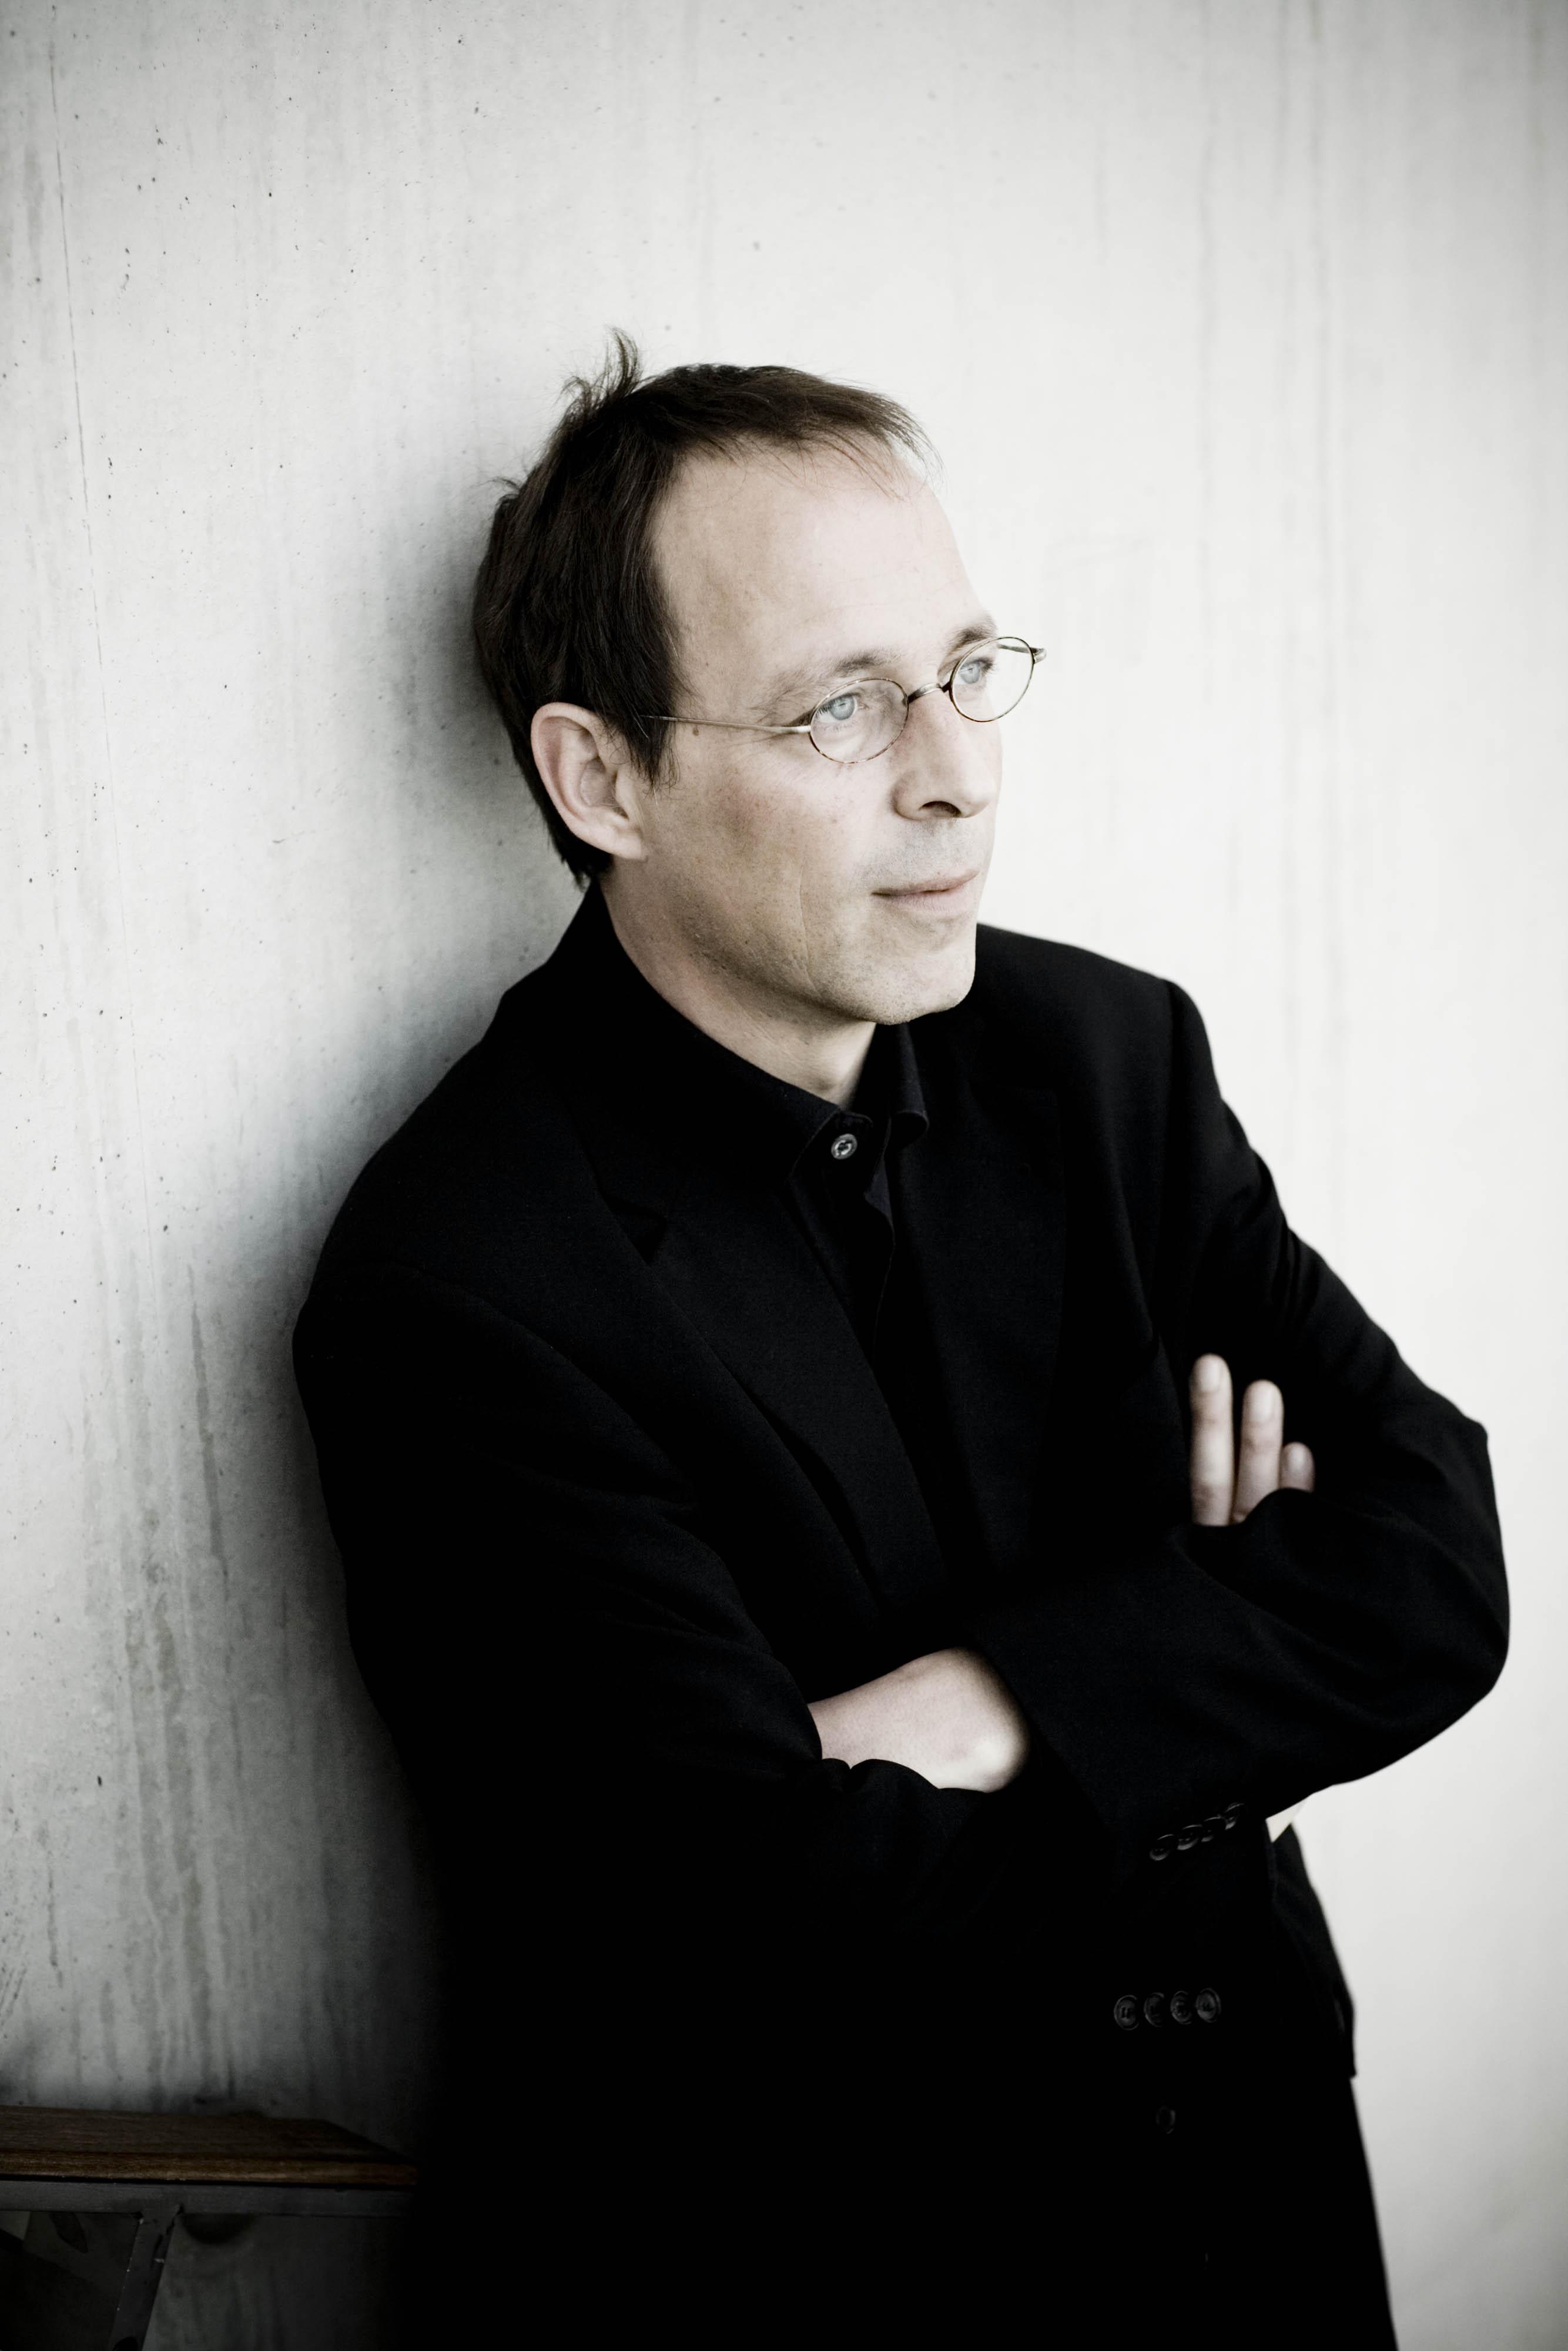 Daniel Reuss (foto: Marco Borggreve)